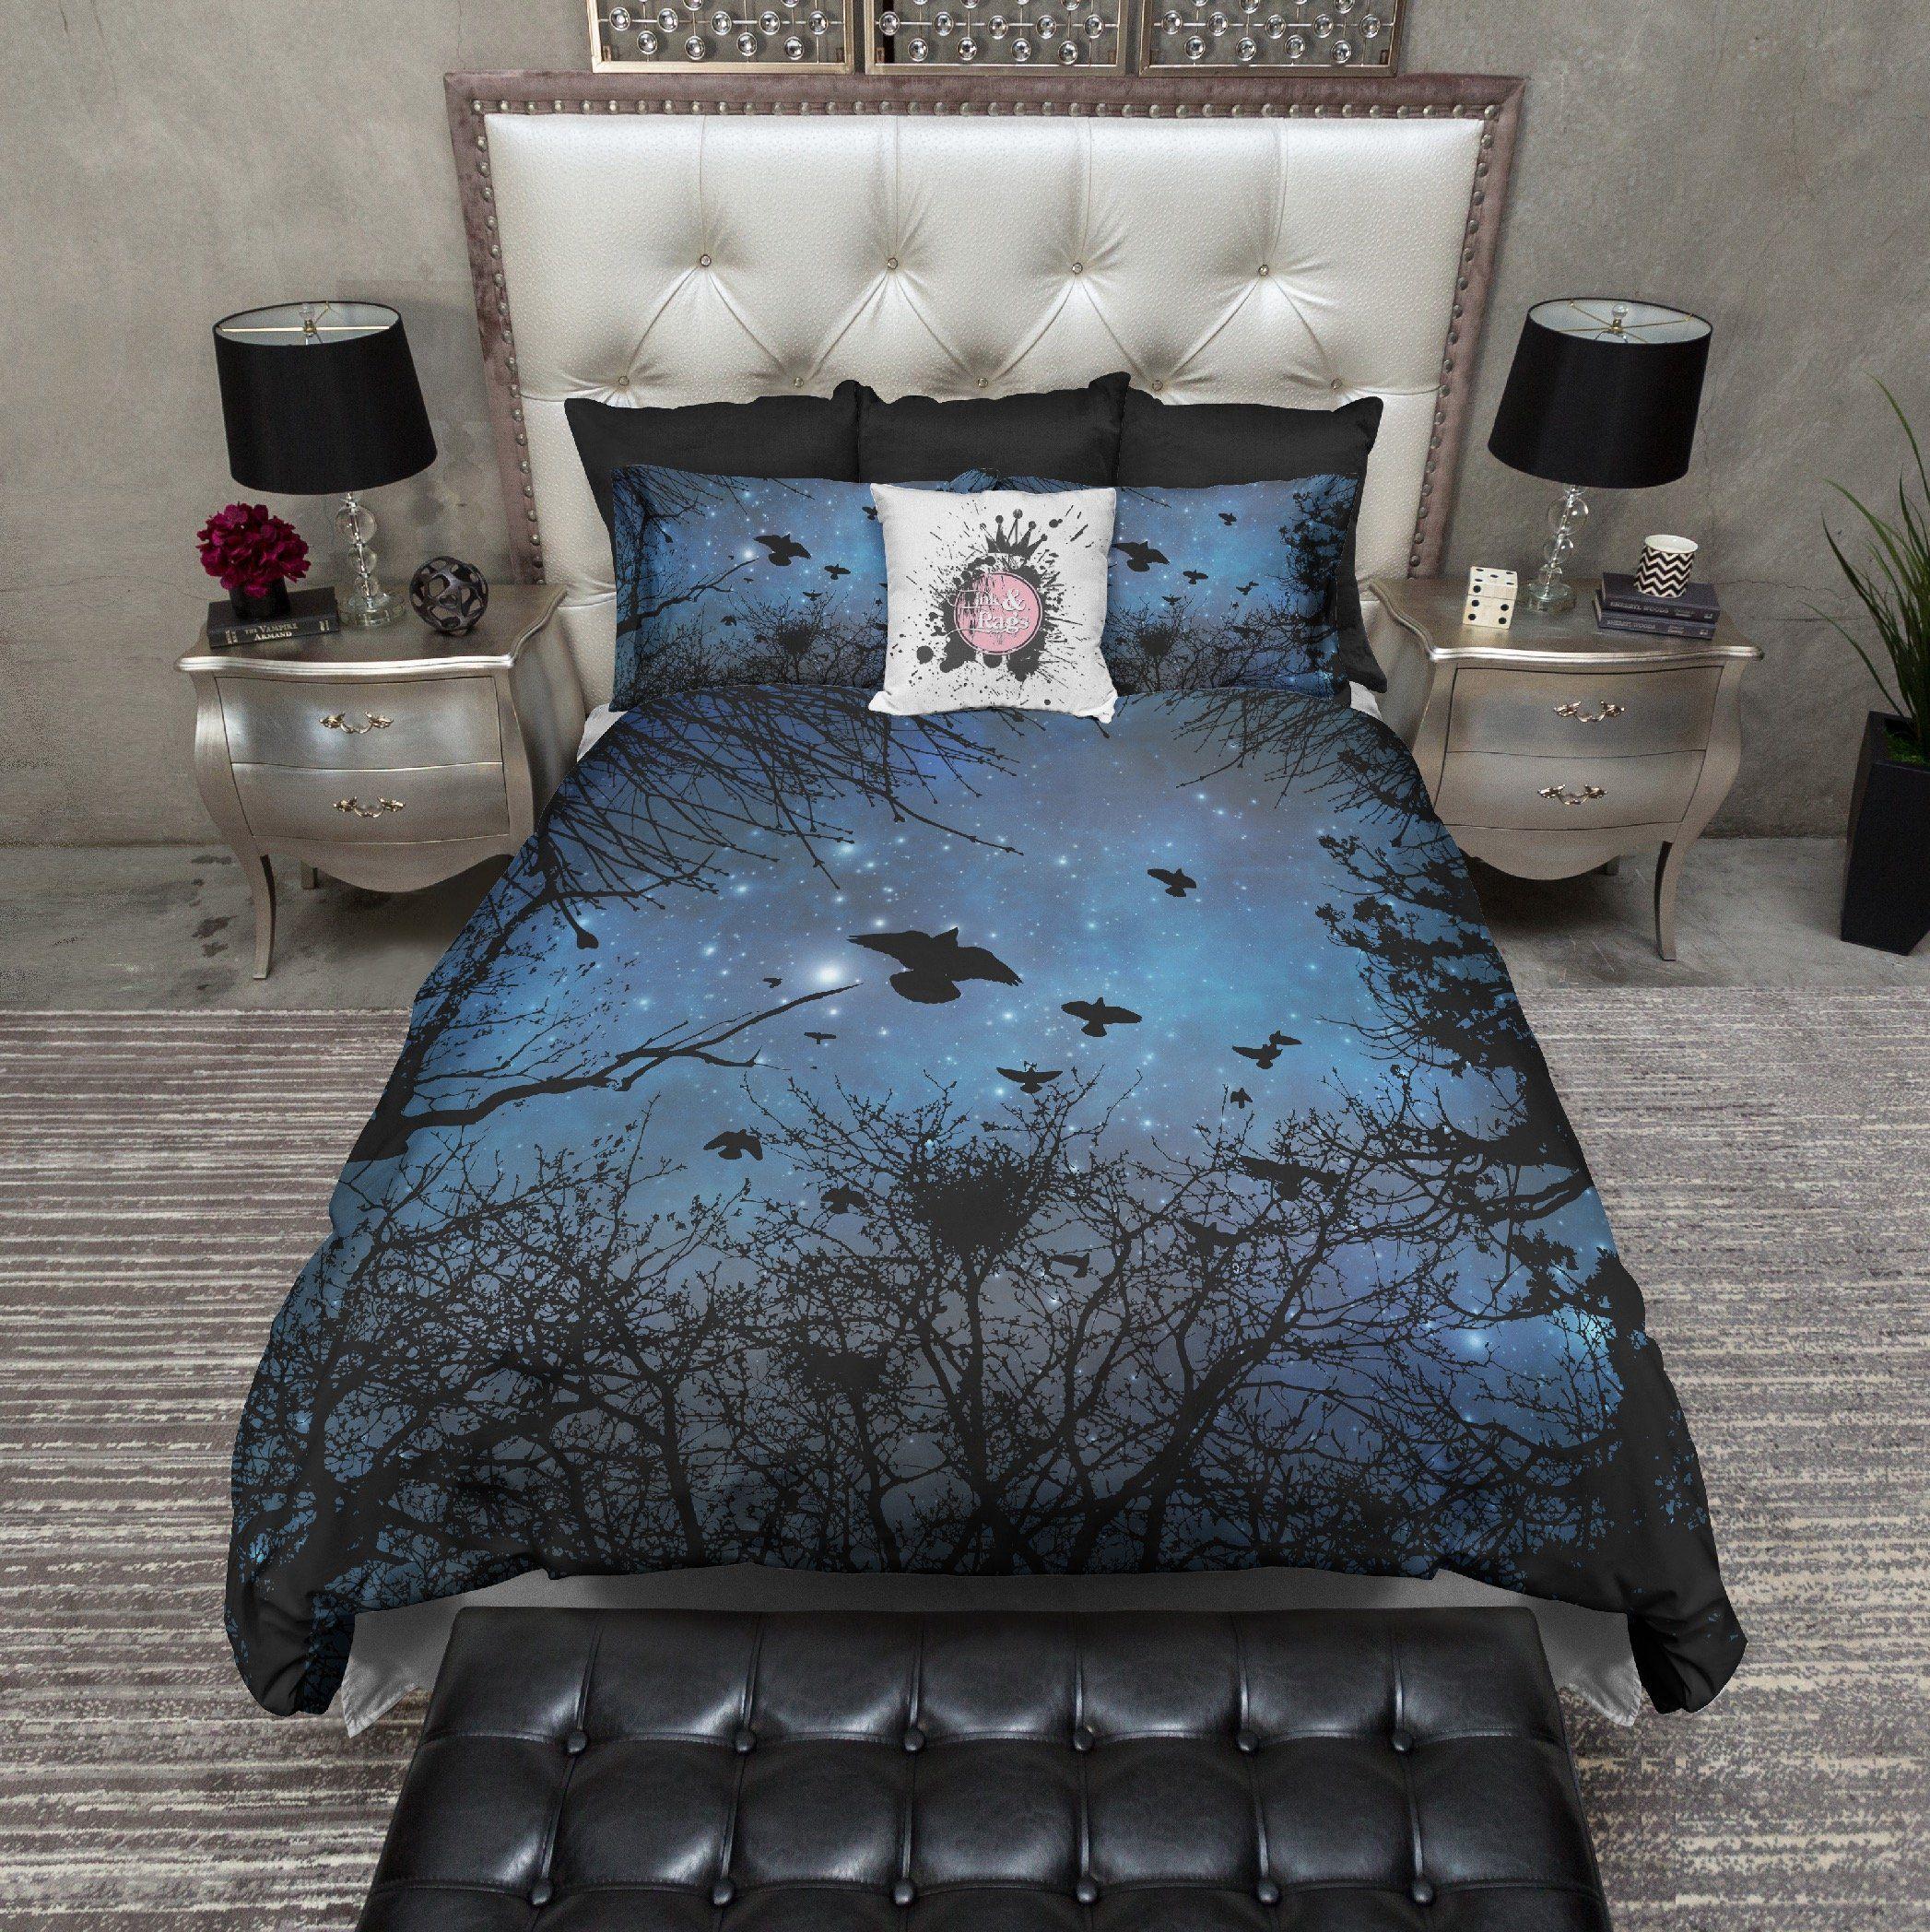 Black Crows In Flight Night Sky Bedding Bed Duvet Bedding Sets